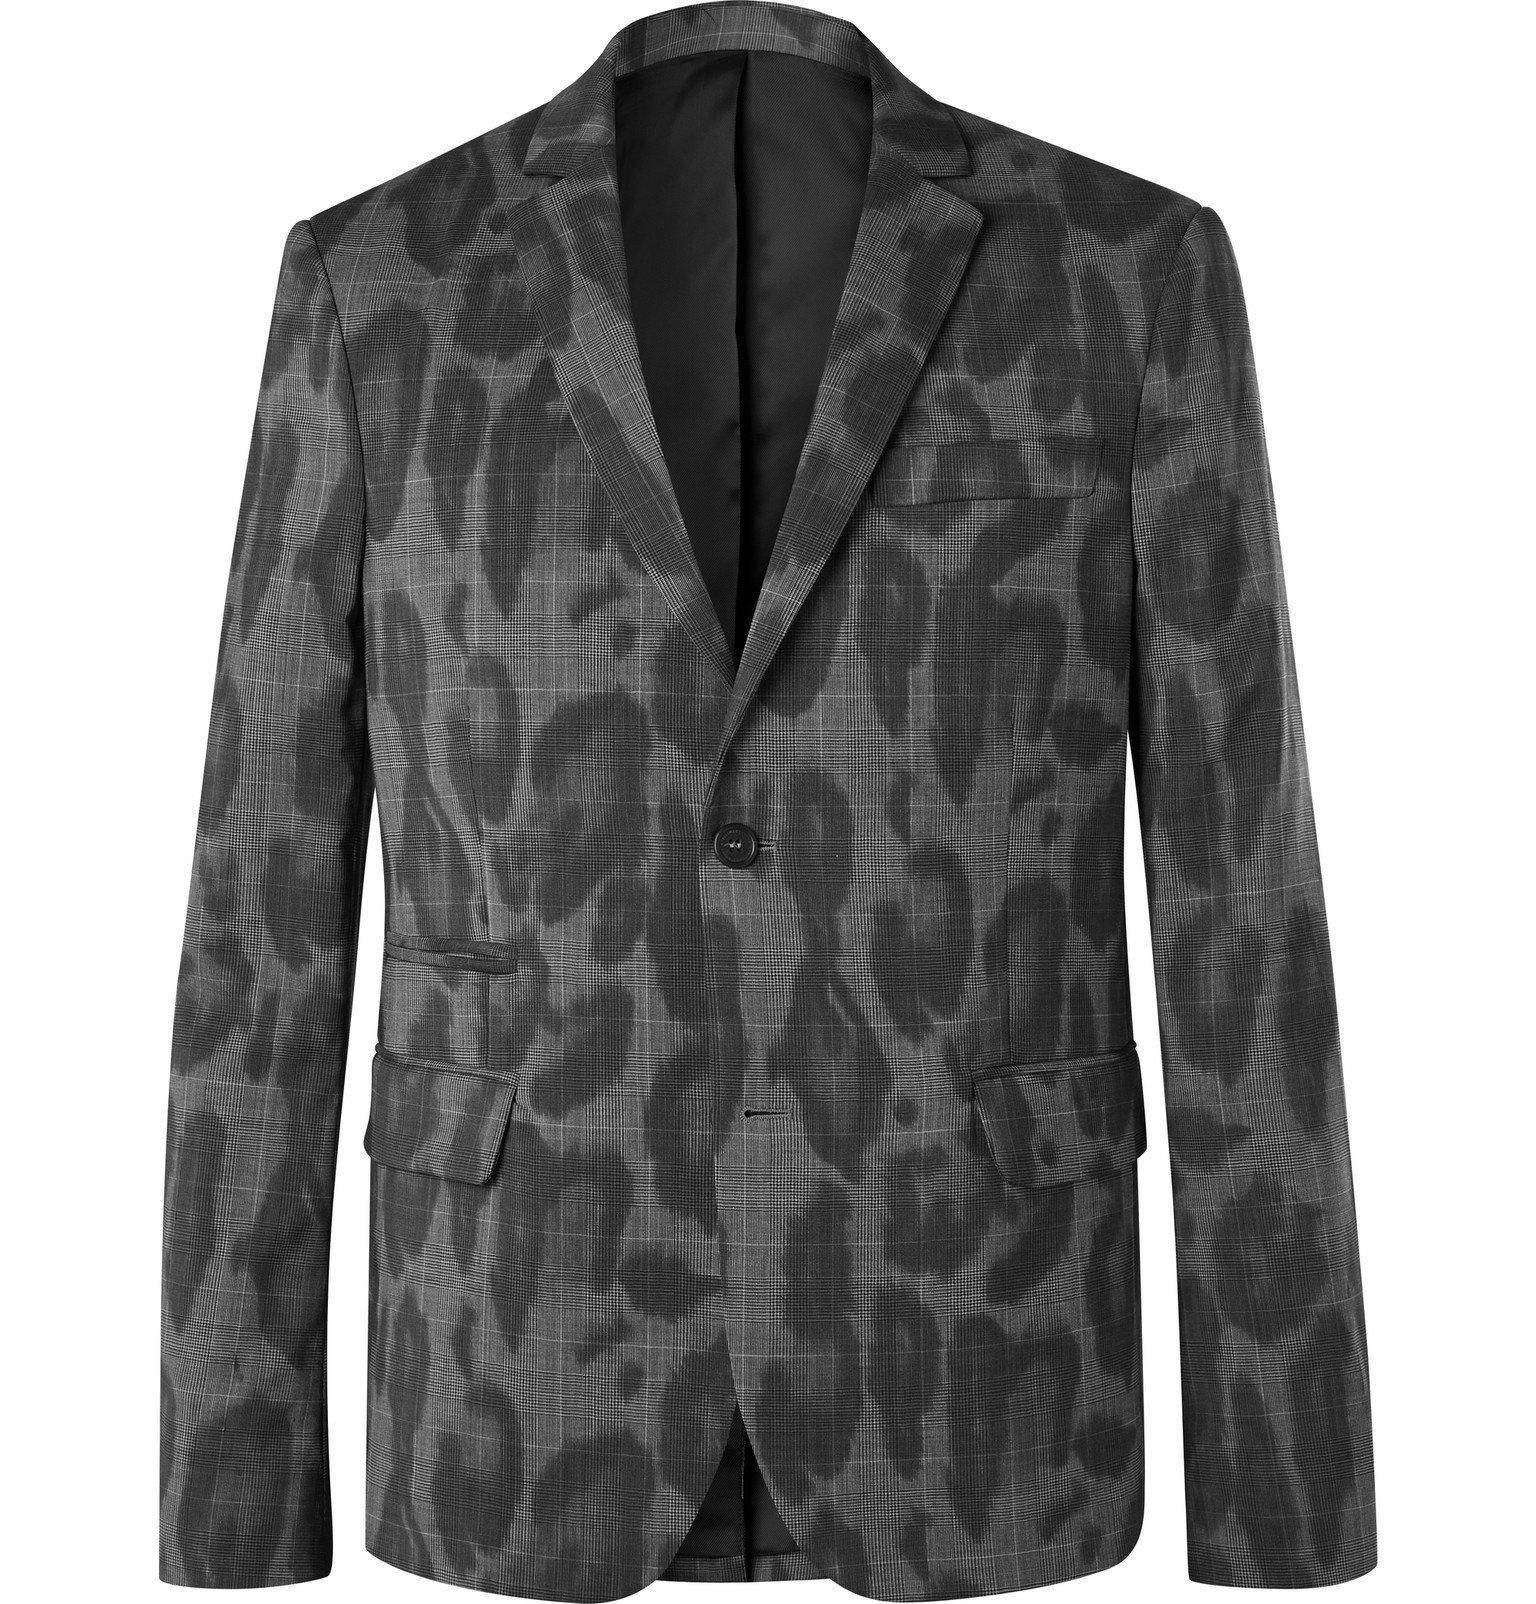 Stella McCartney - Bobby Printed Wool Suit Jacket - Gray